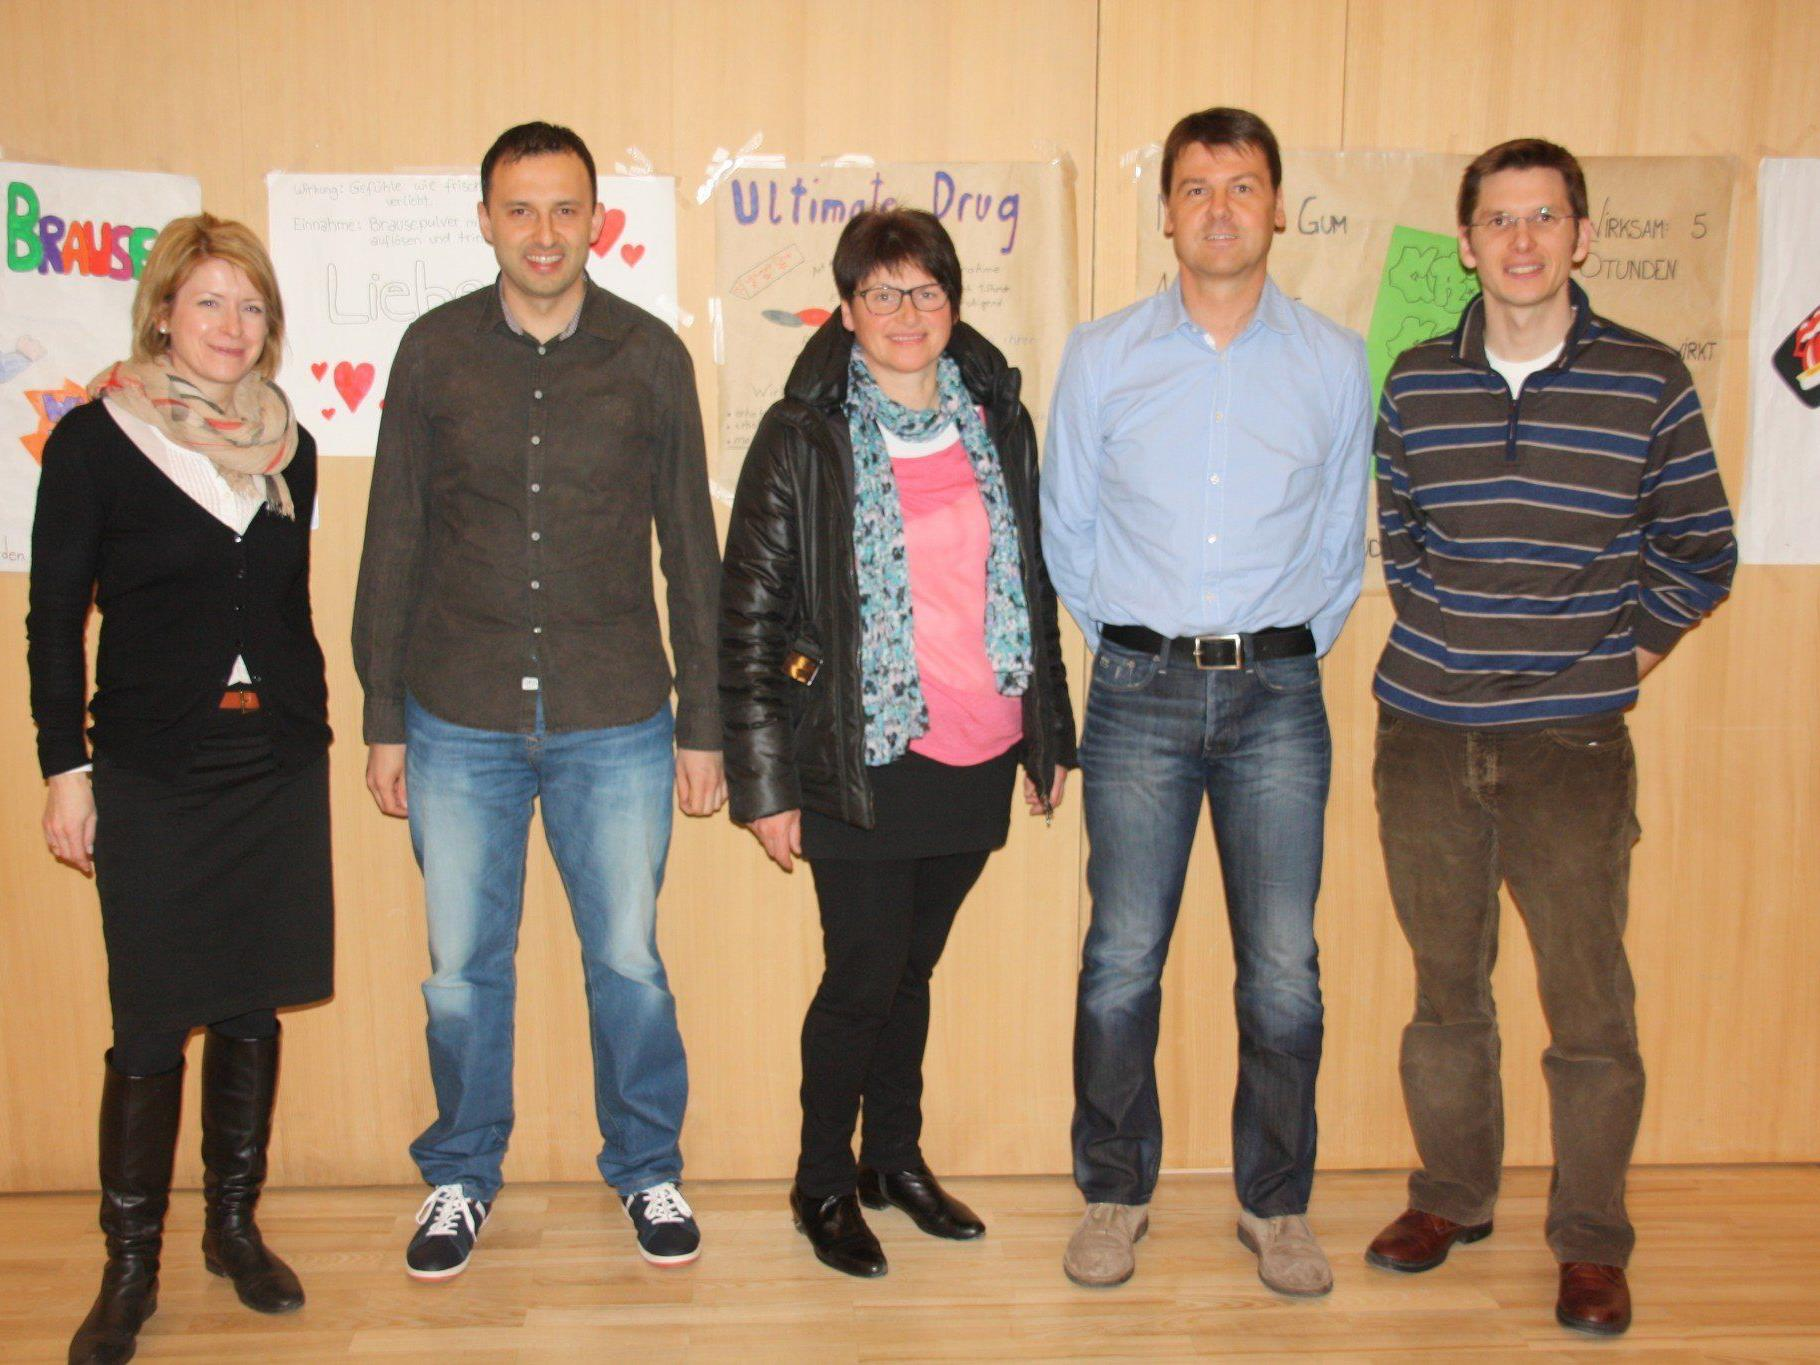 Heidi Achammer, Alexander Muxel, Frieda Moosbrugger, Dietmar Fetz und Martin Onder (v.l.)